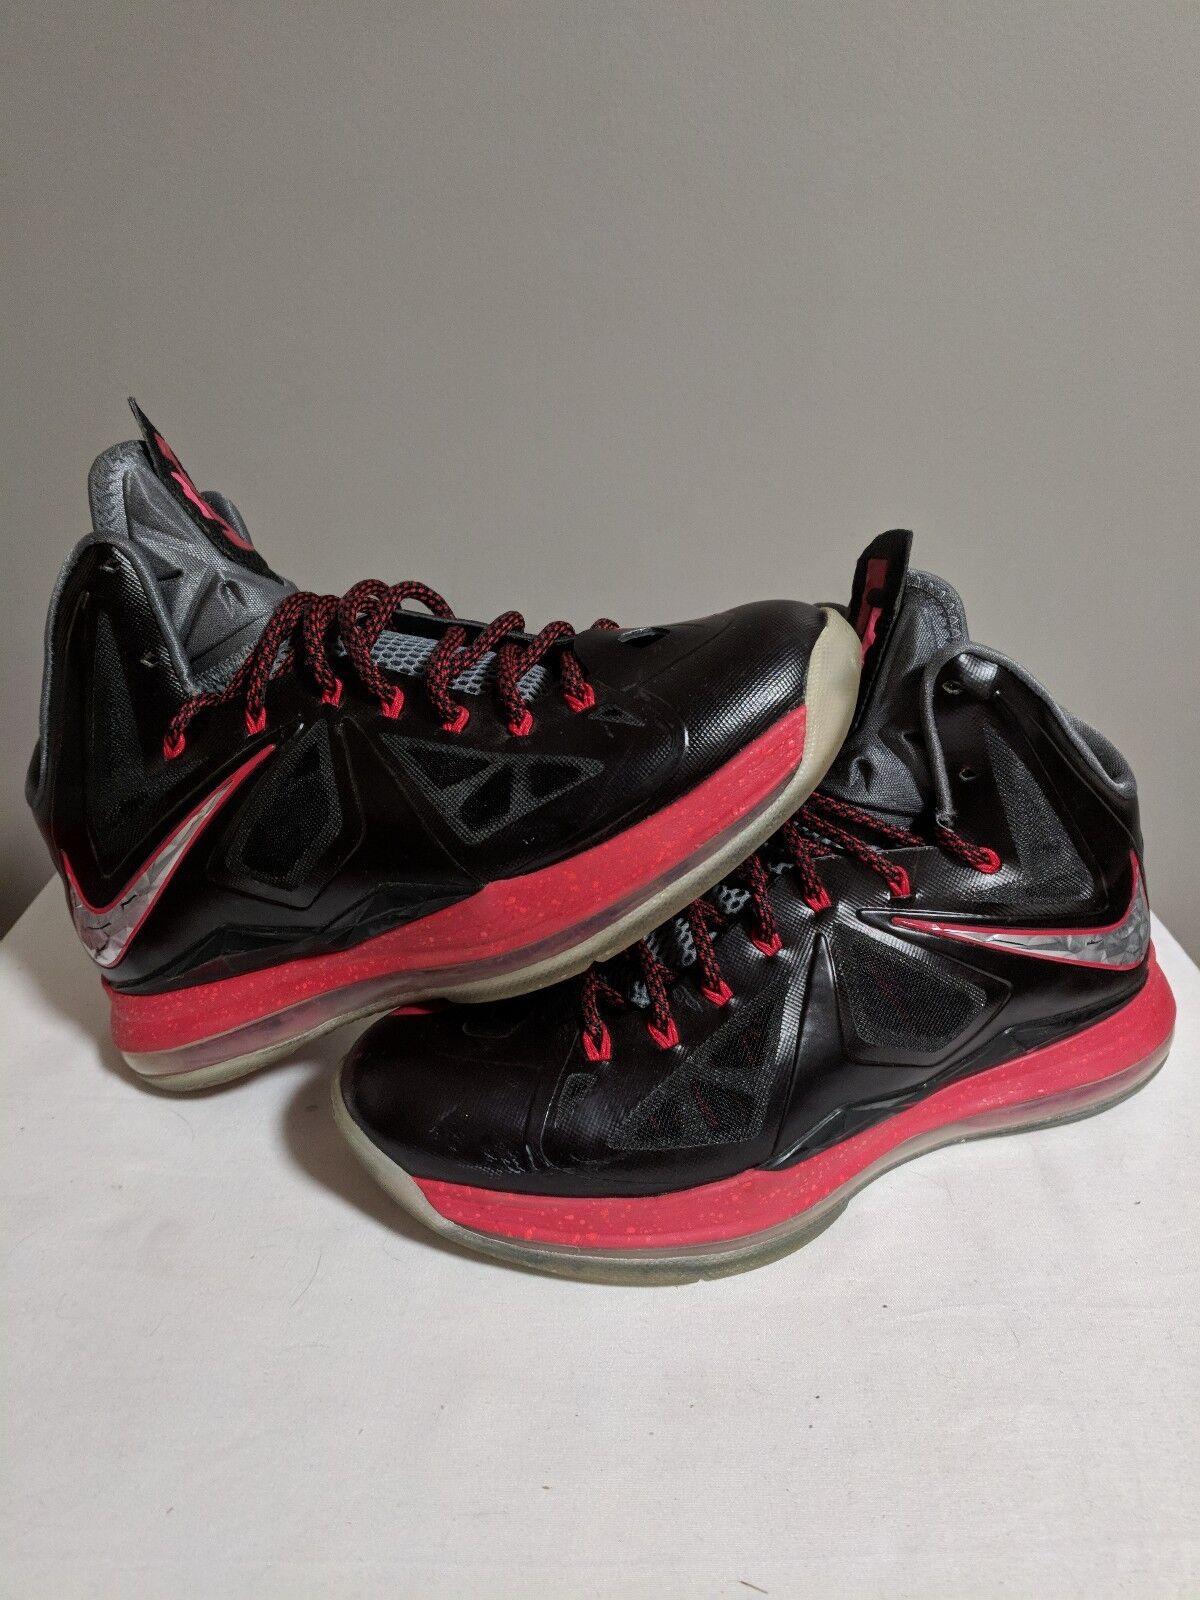 Lebron 10 X Pressure black red white bred Size 9 Nike plus